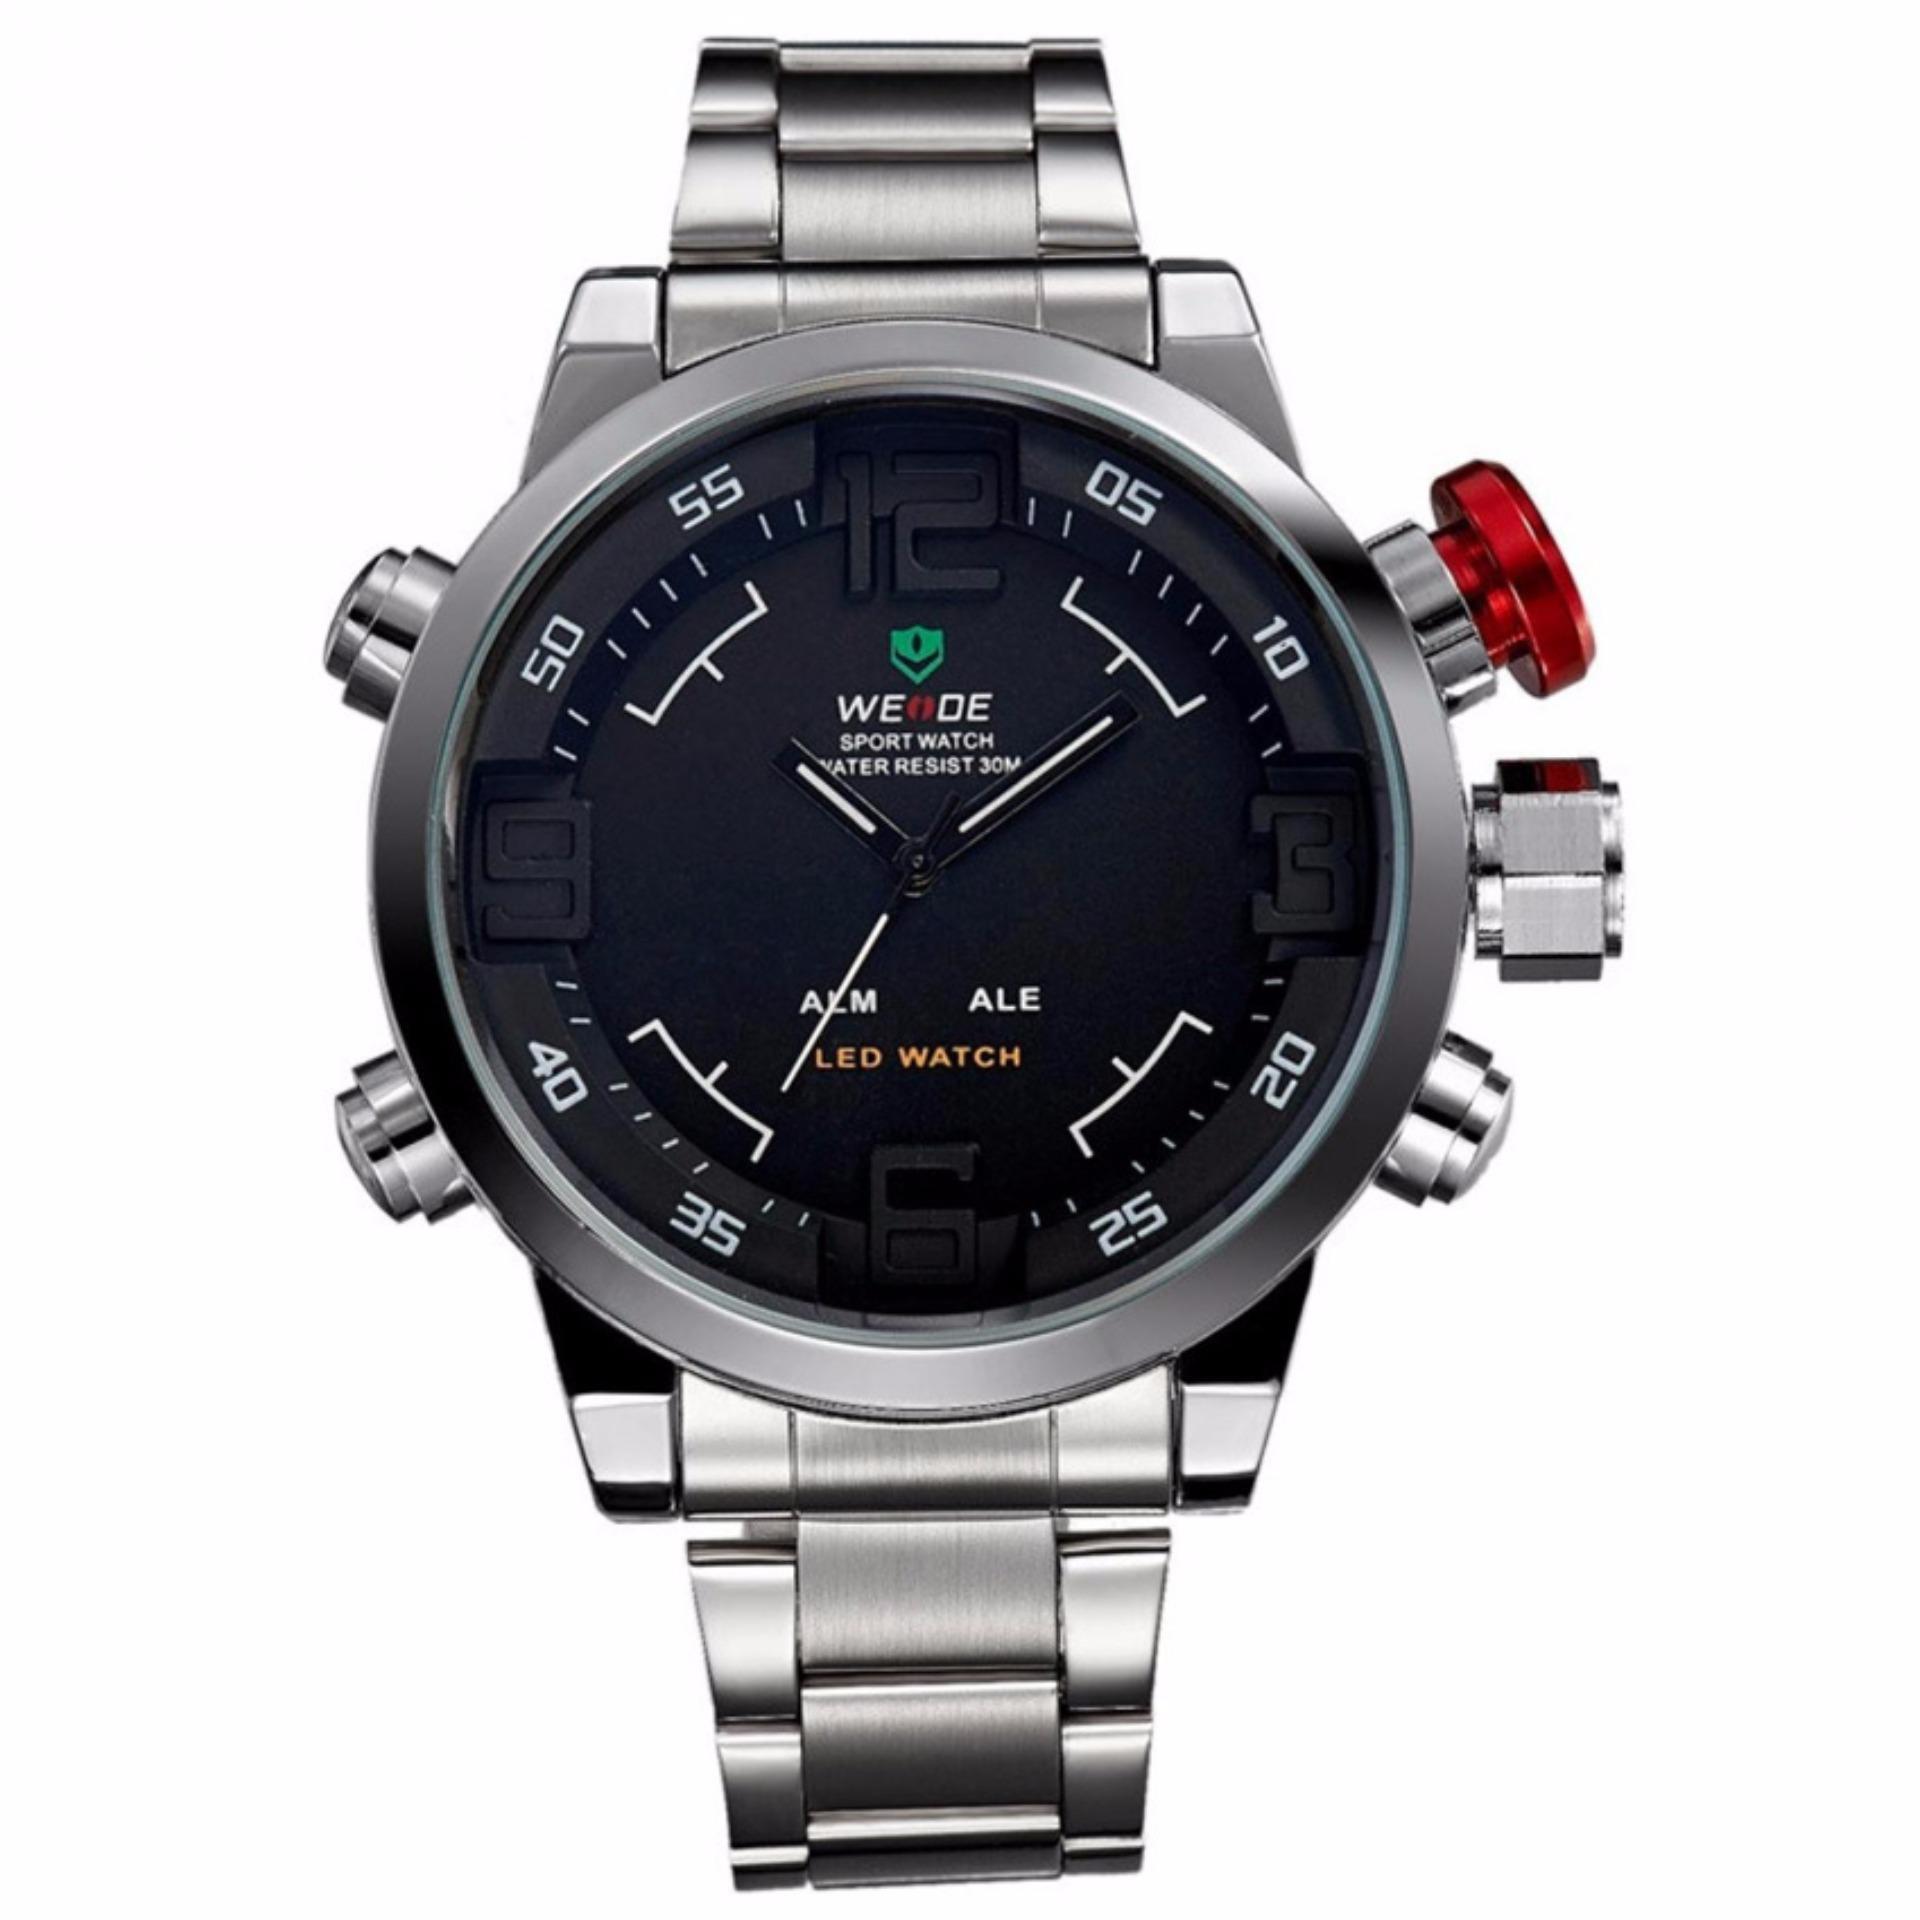 Weide WH2309 Men s Military Sports Band Digital LED Dual Time Display Jam Tangan